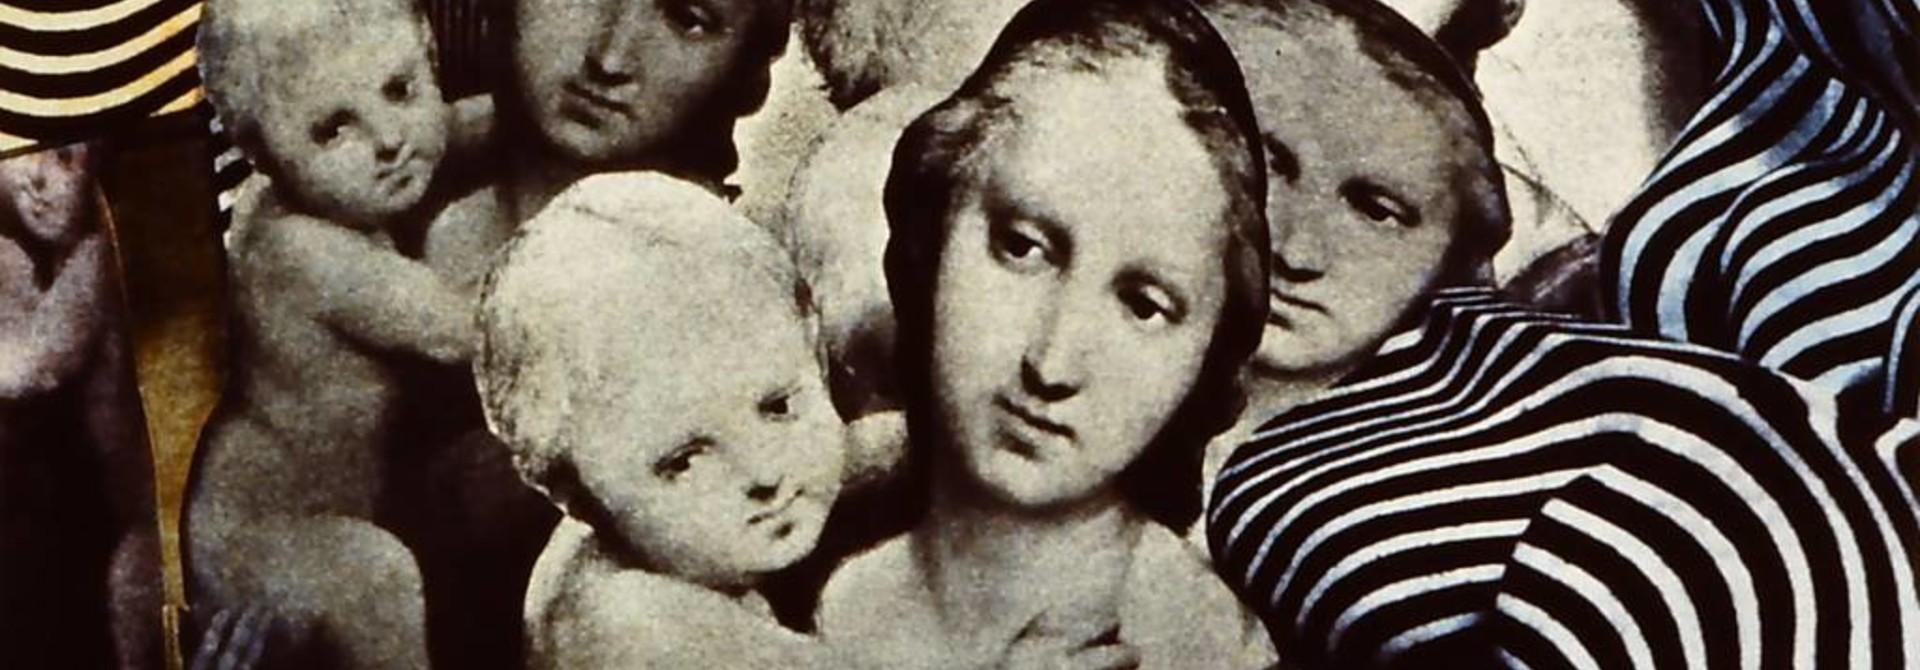 Raphaels Madonna